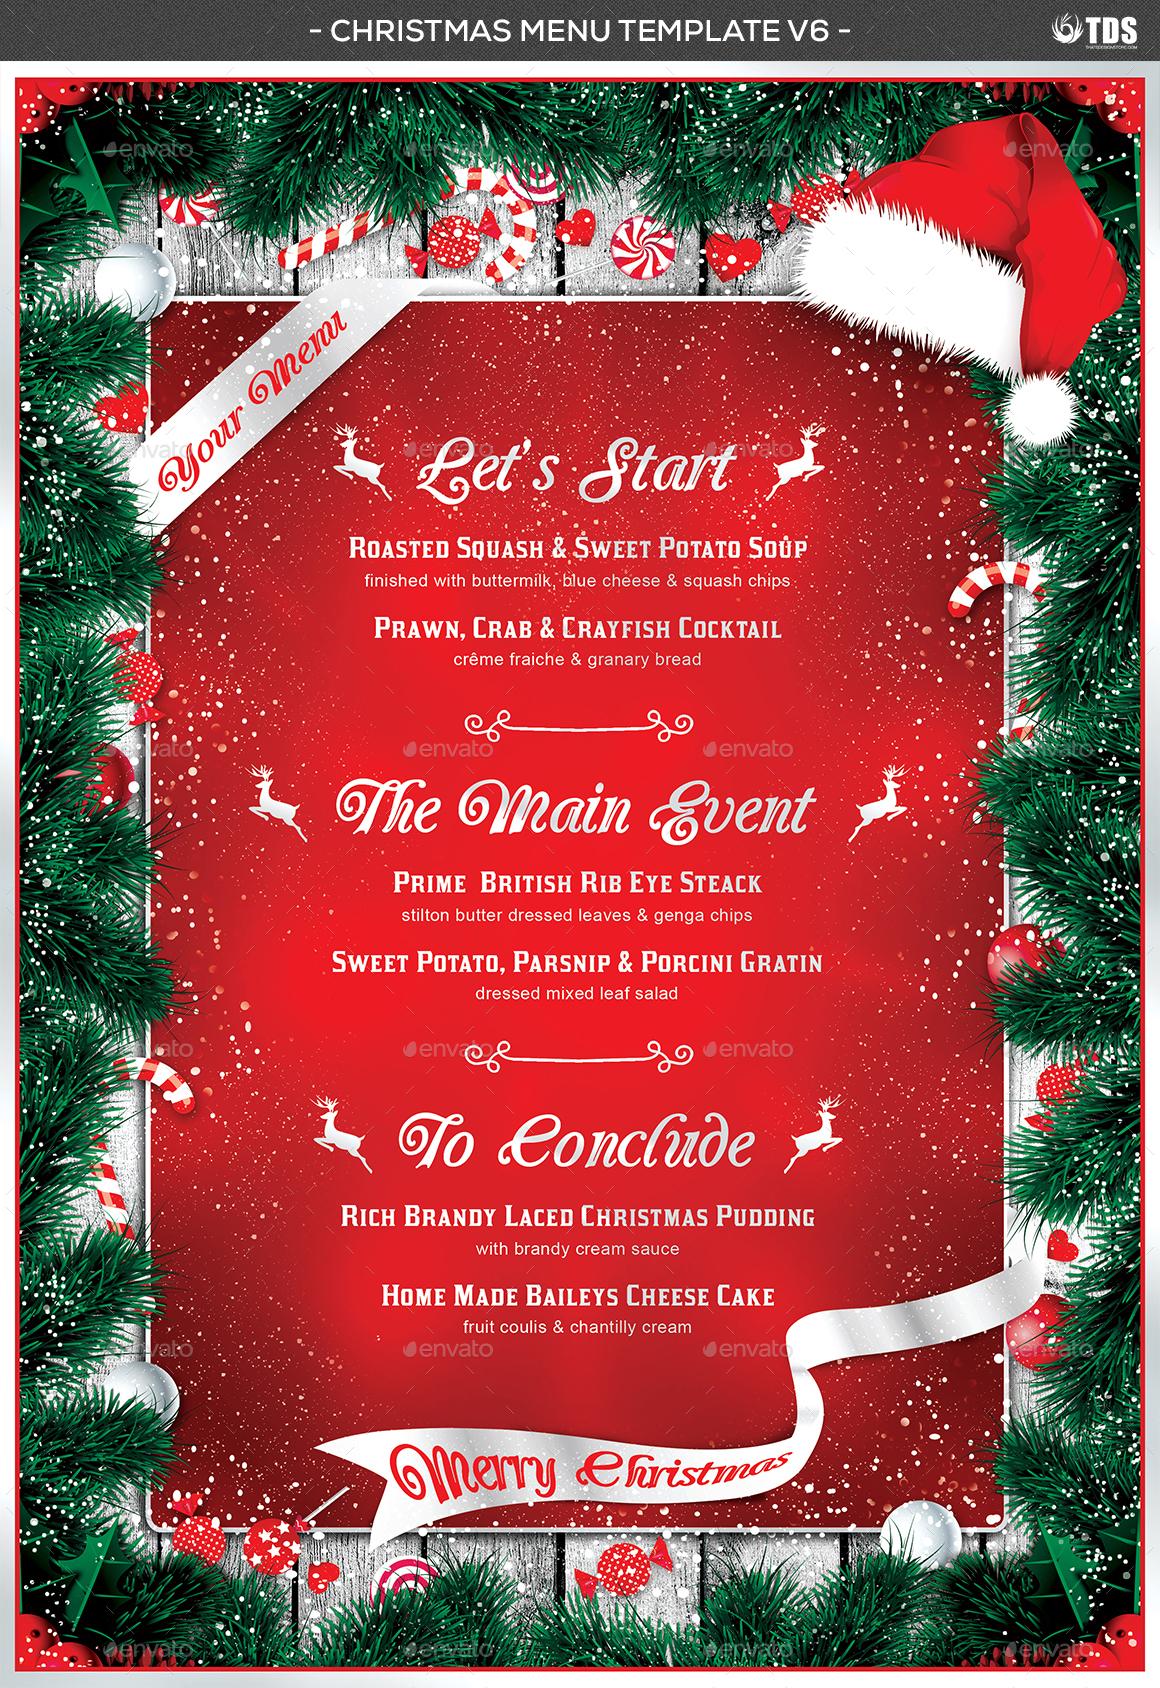 christmas menu template v6 by lou606 graphicriver 01 christmas menu template v6 jpg 02 christmas menu template v6 jpg 03 christmas menu template v6 jpg